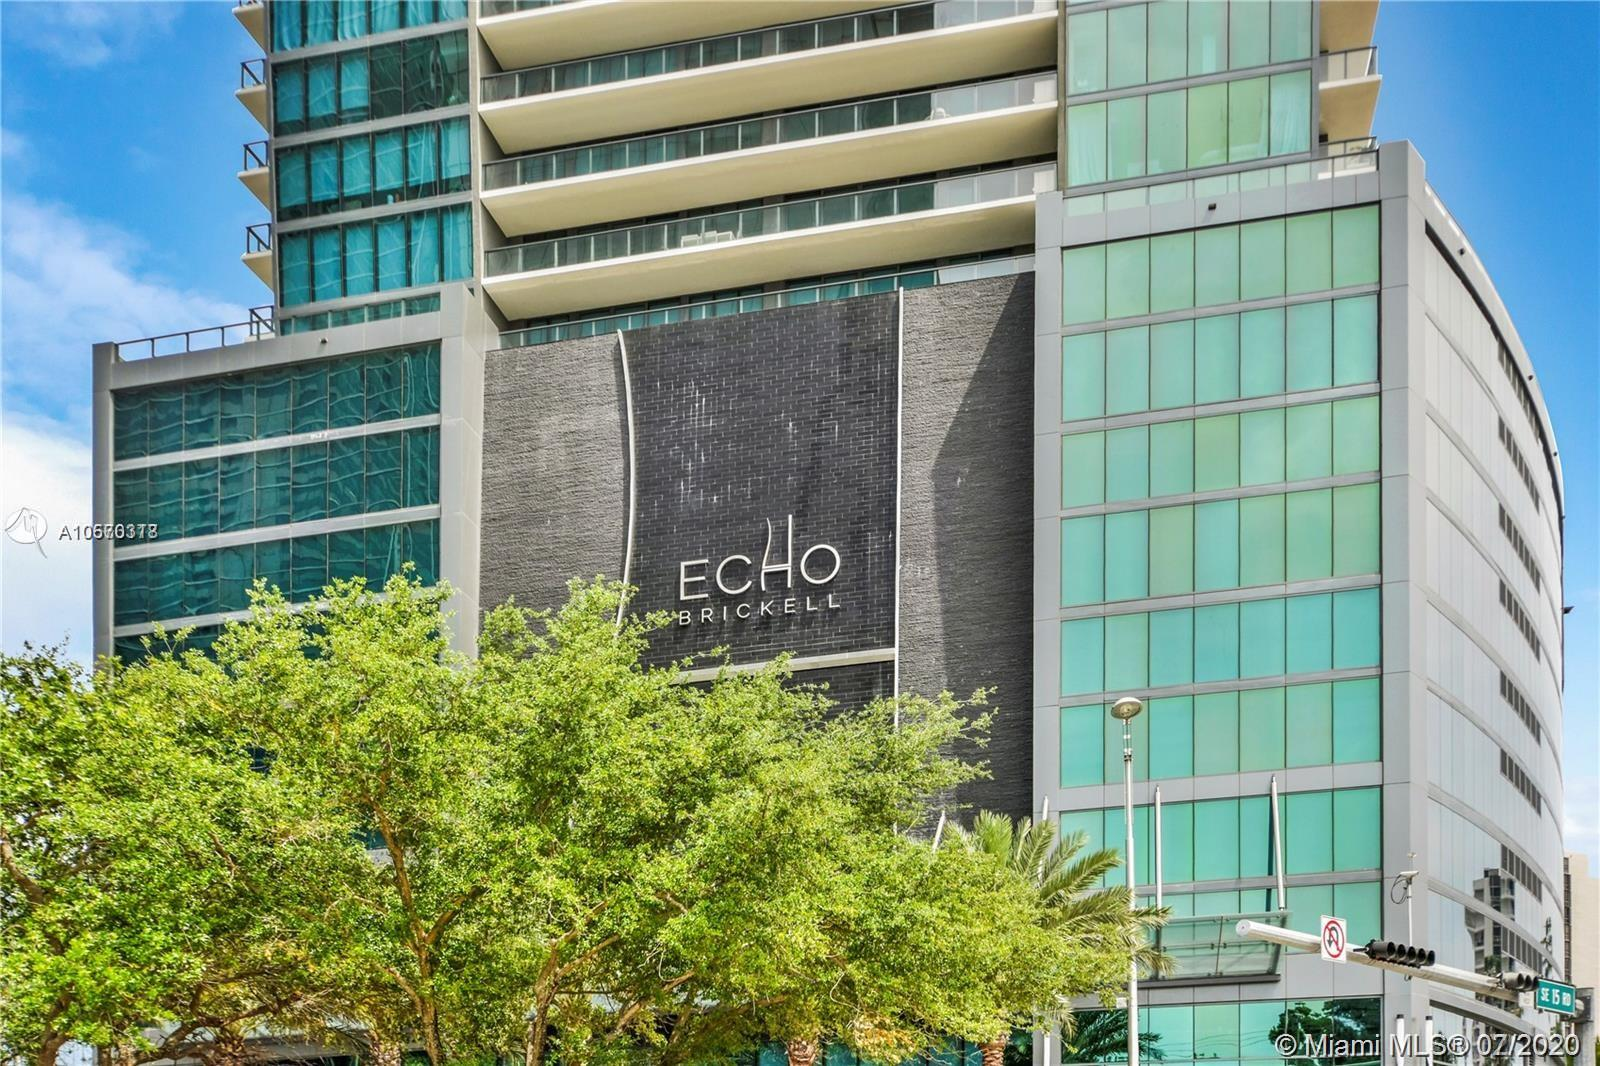 Echo Brickell image #2